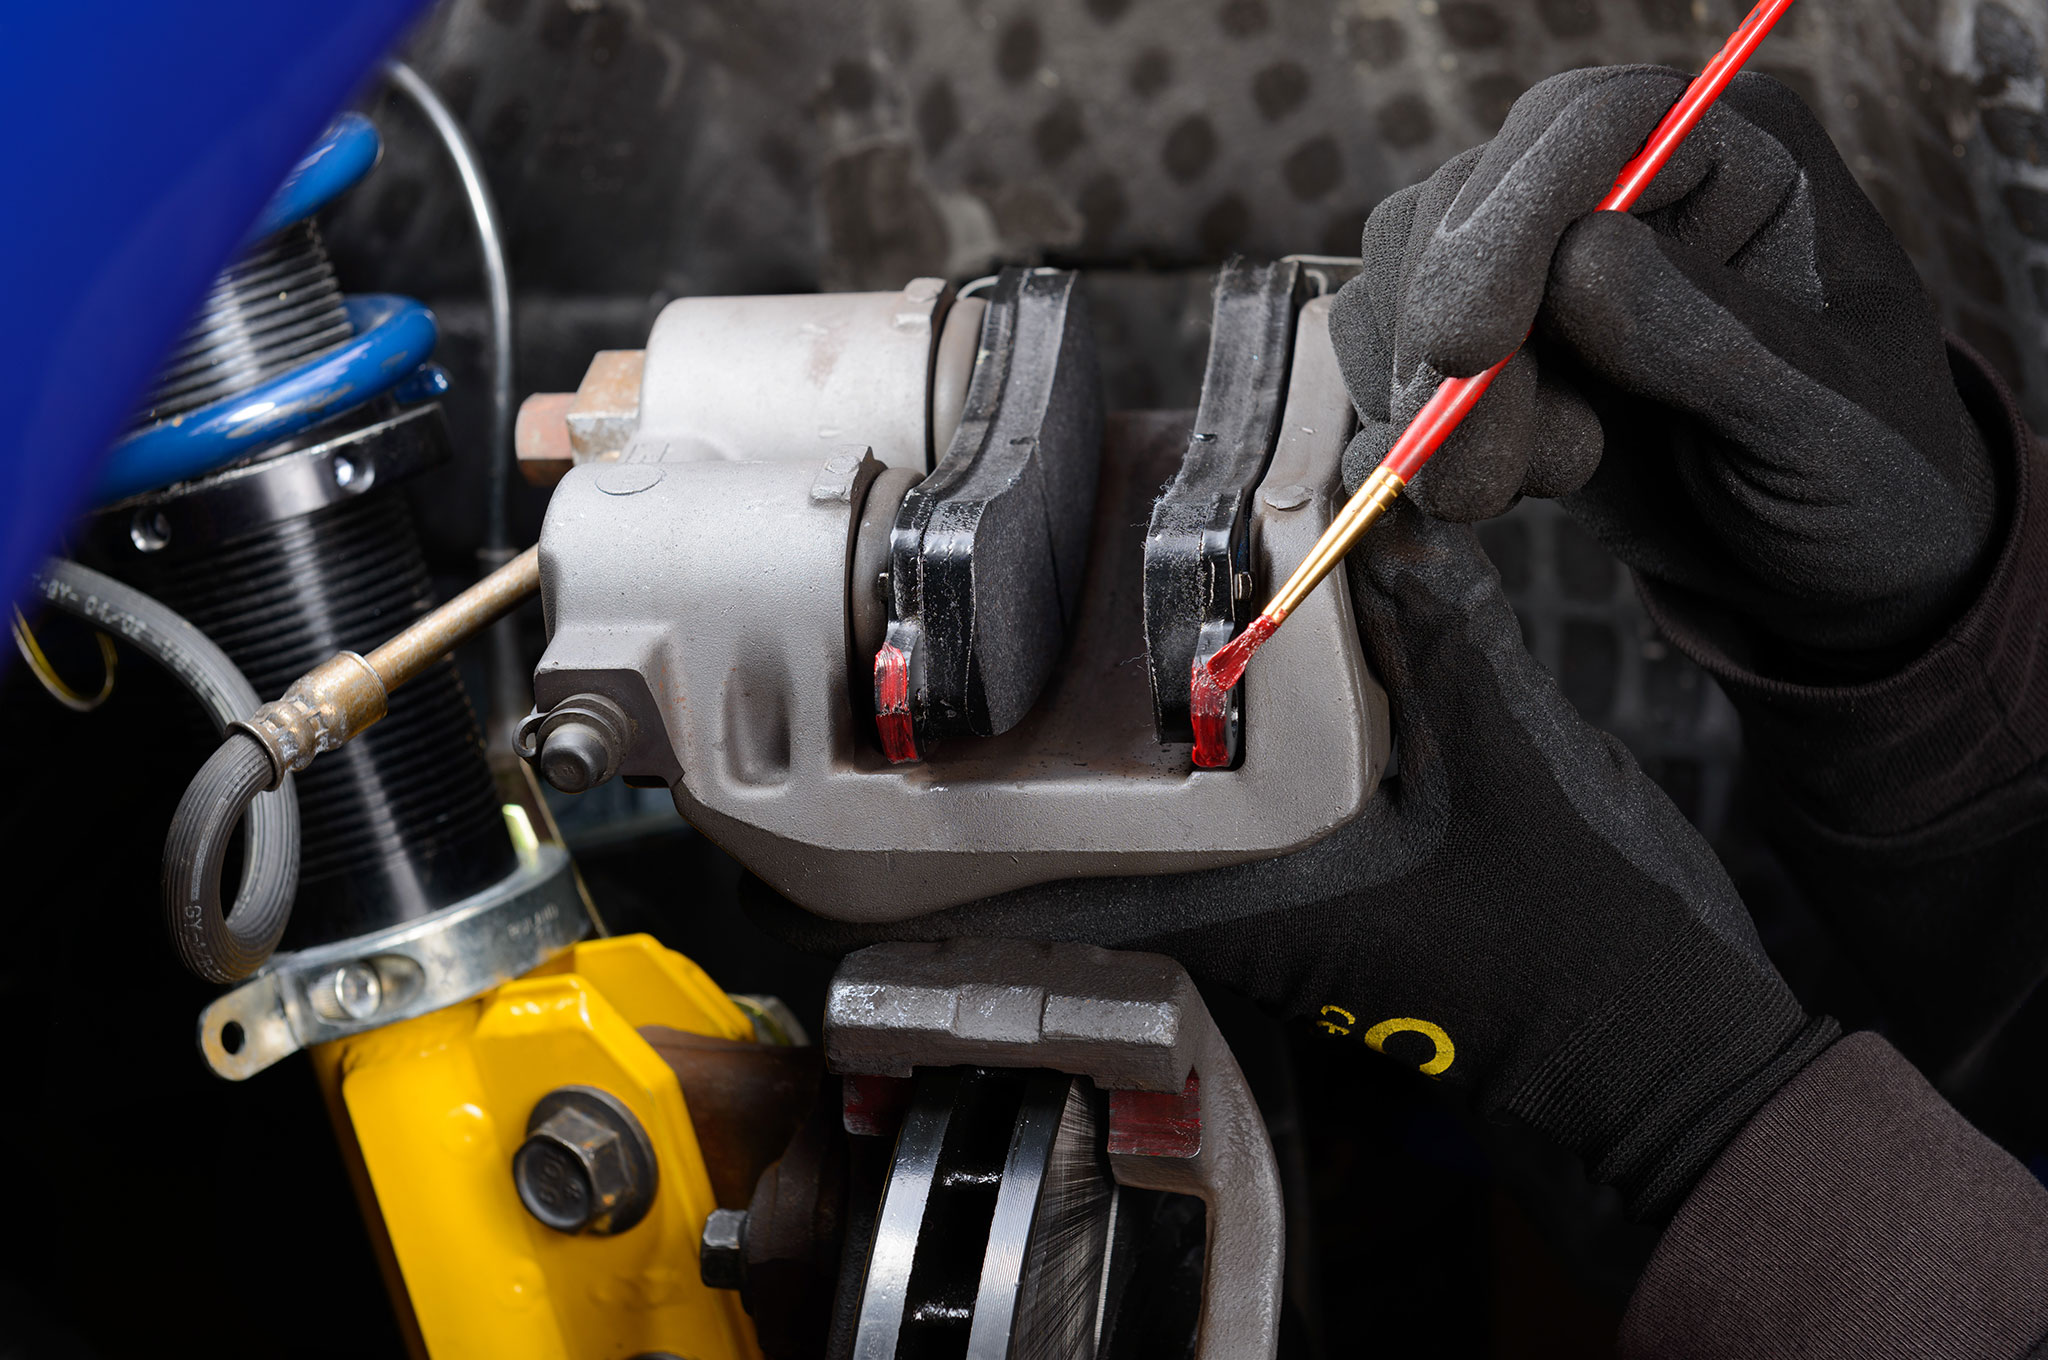 22 2003 Ford Mustang Cobra Applying Thin Layer Of High Temp Brake Parts Lube